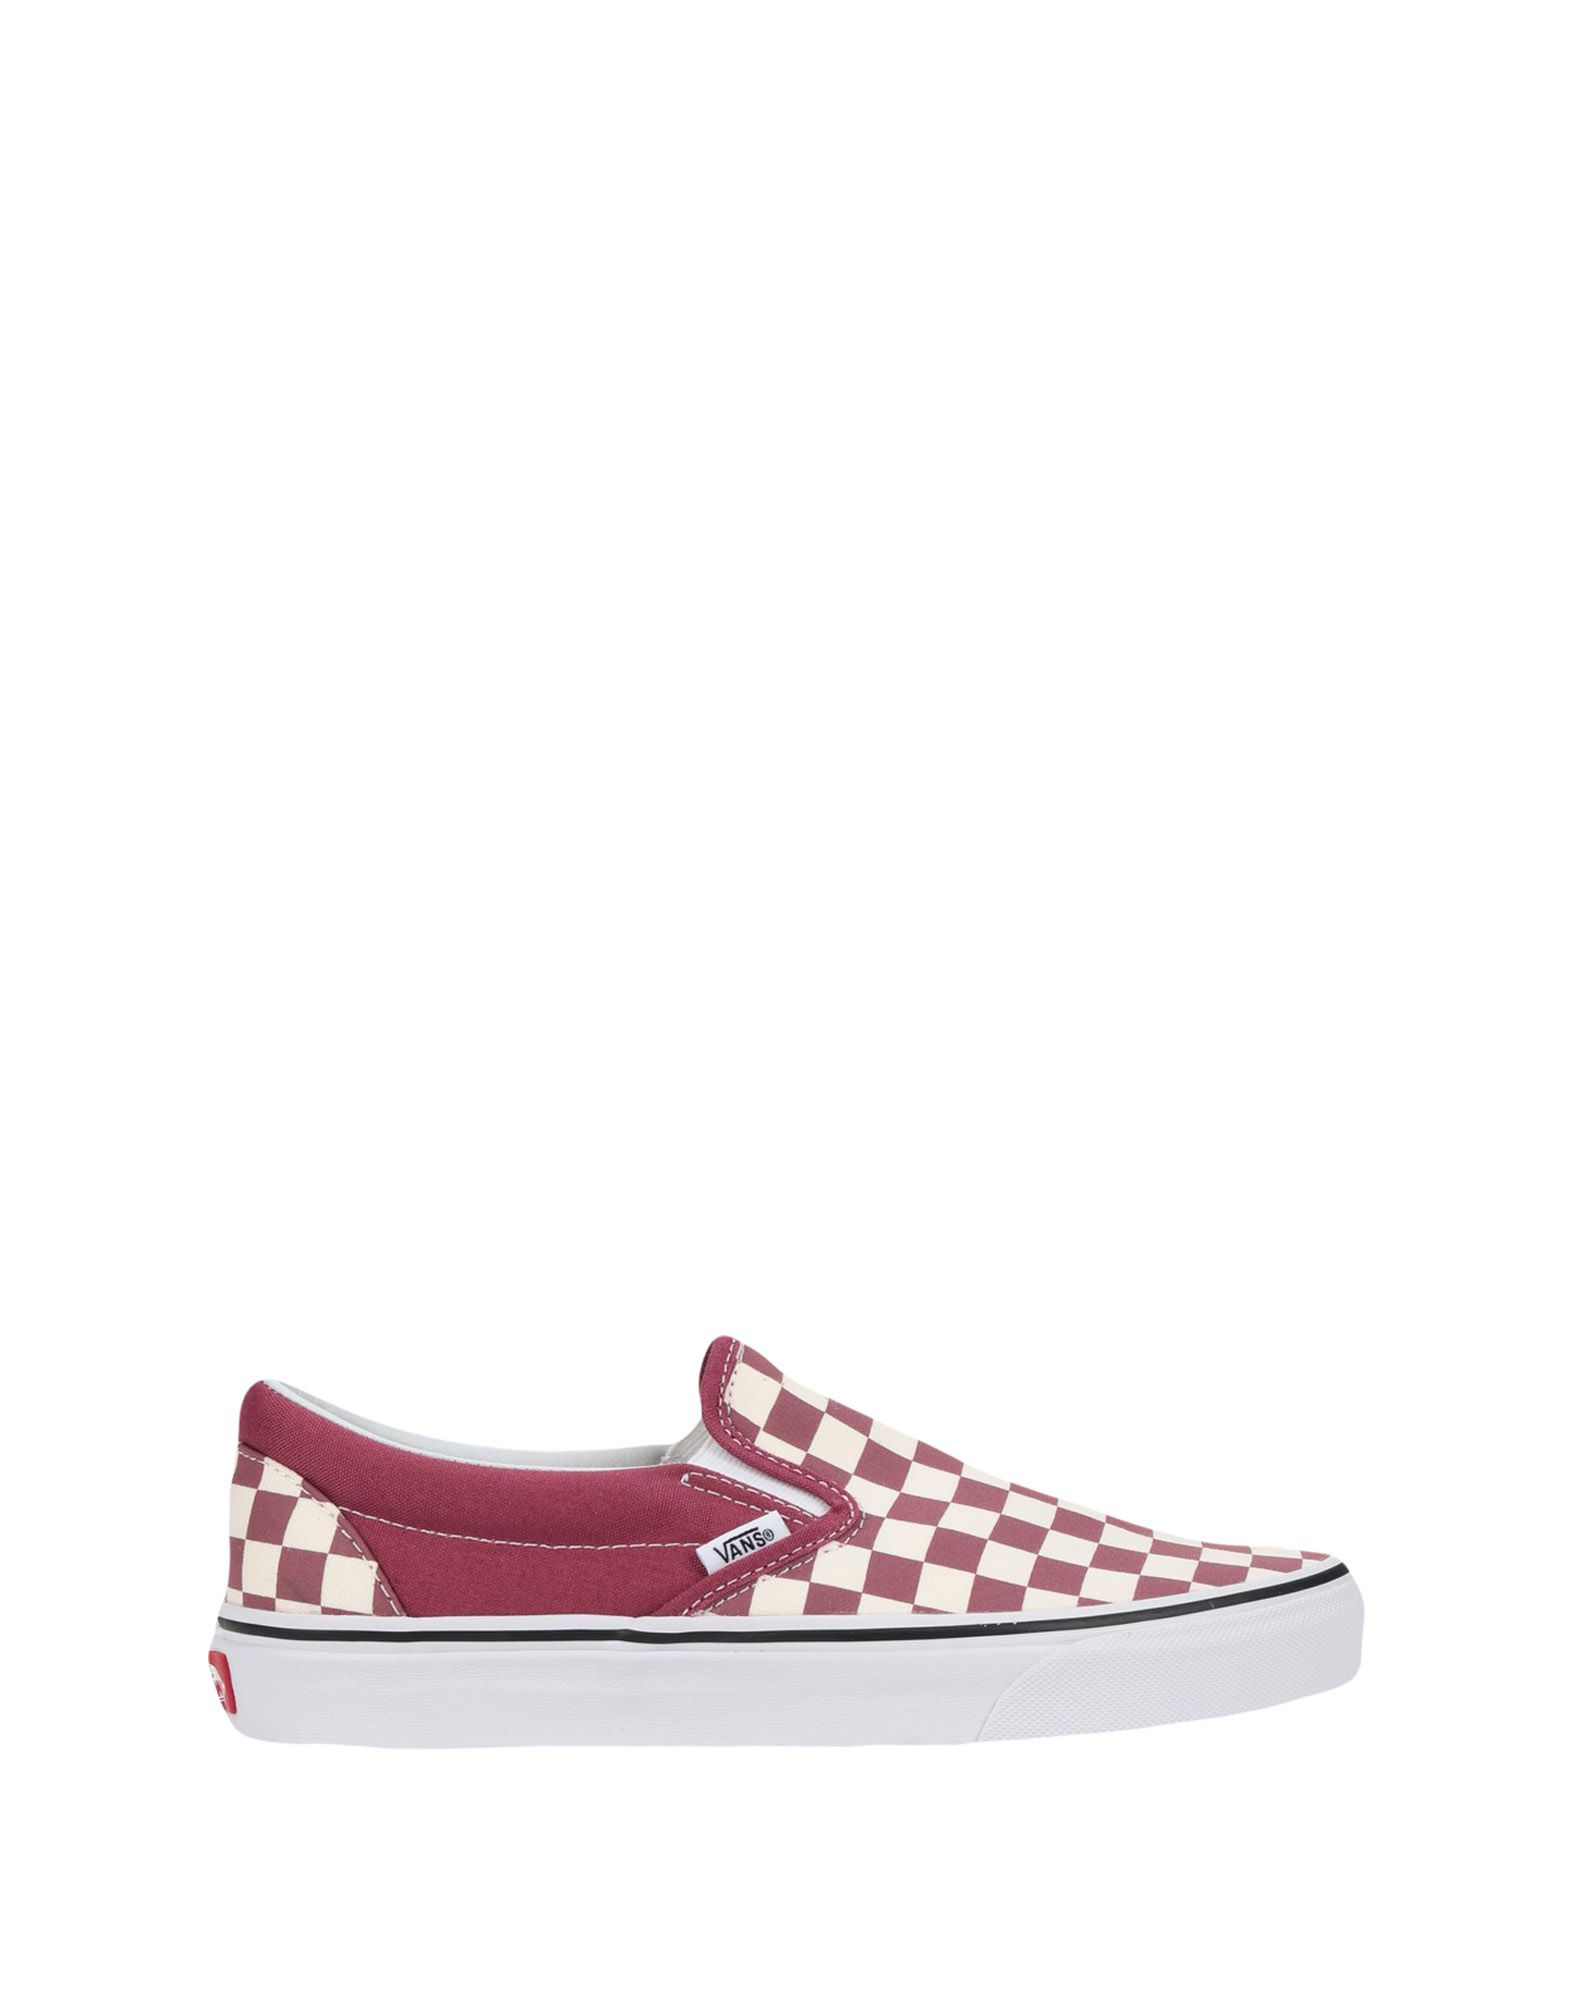 Scarpe da Ginnastica Vans Ua Classic Slip-On - Donna - 11551951BU